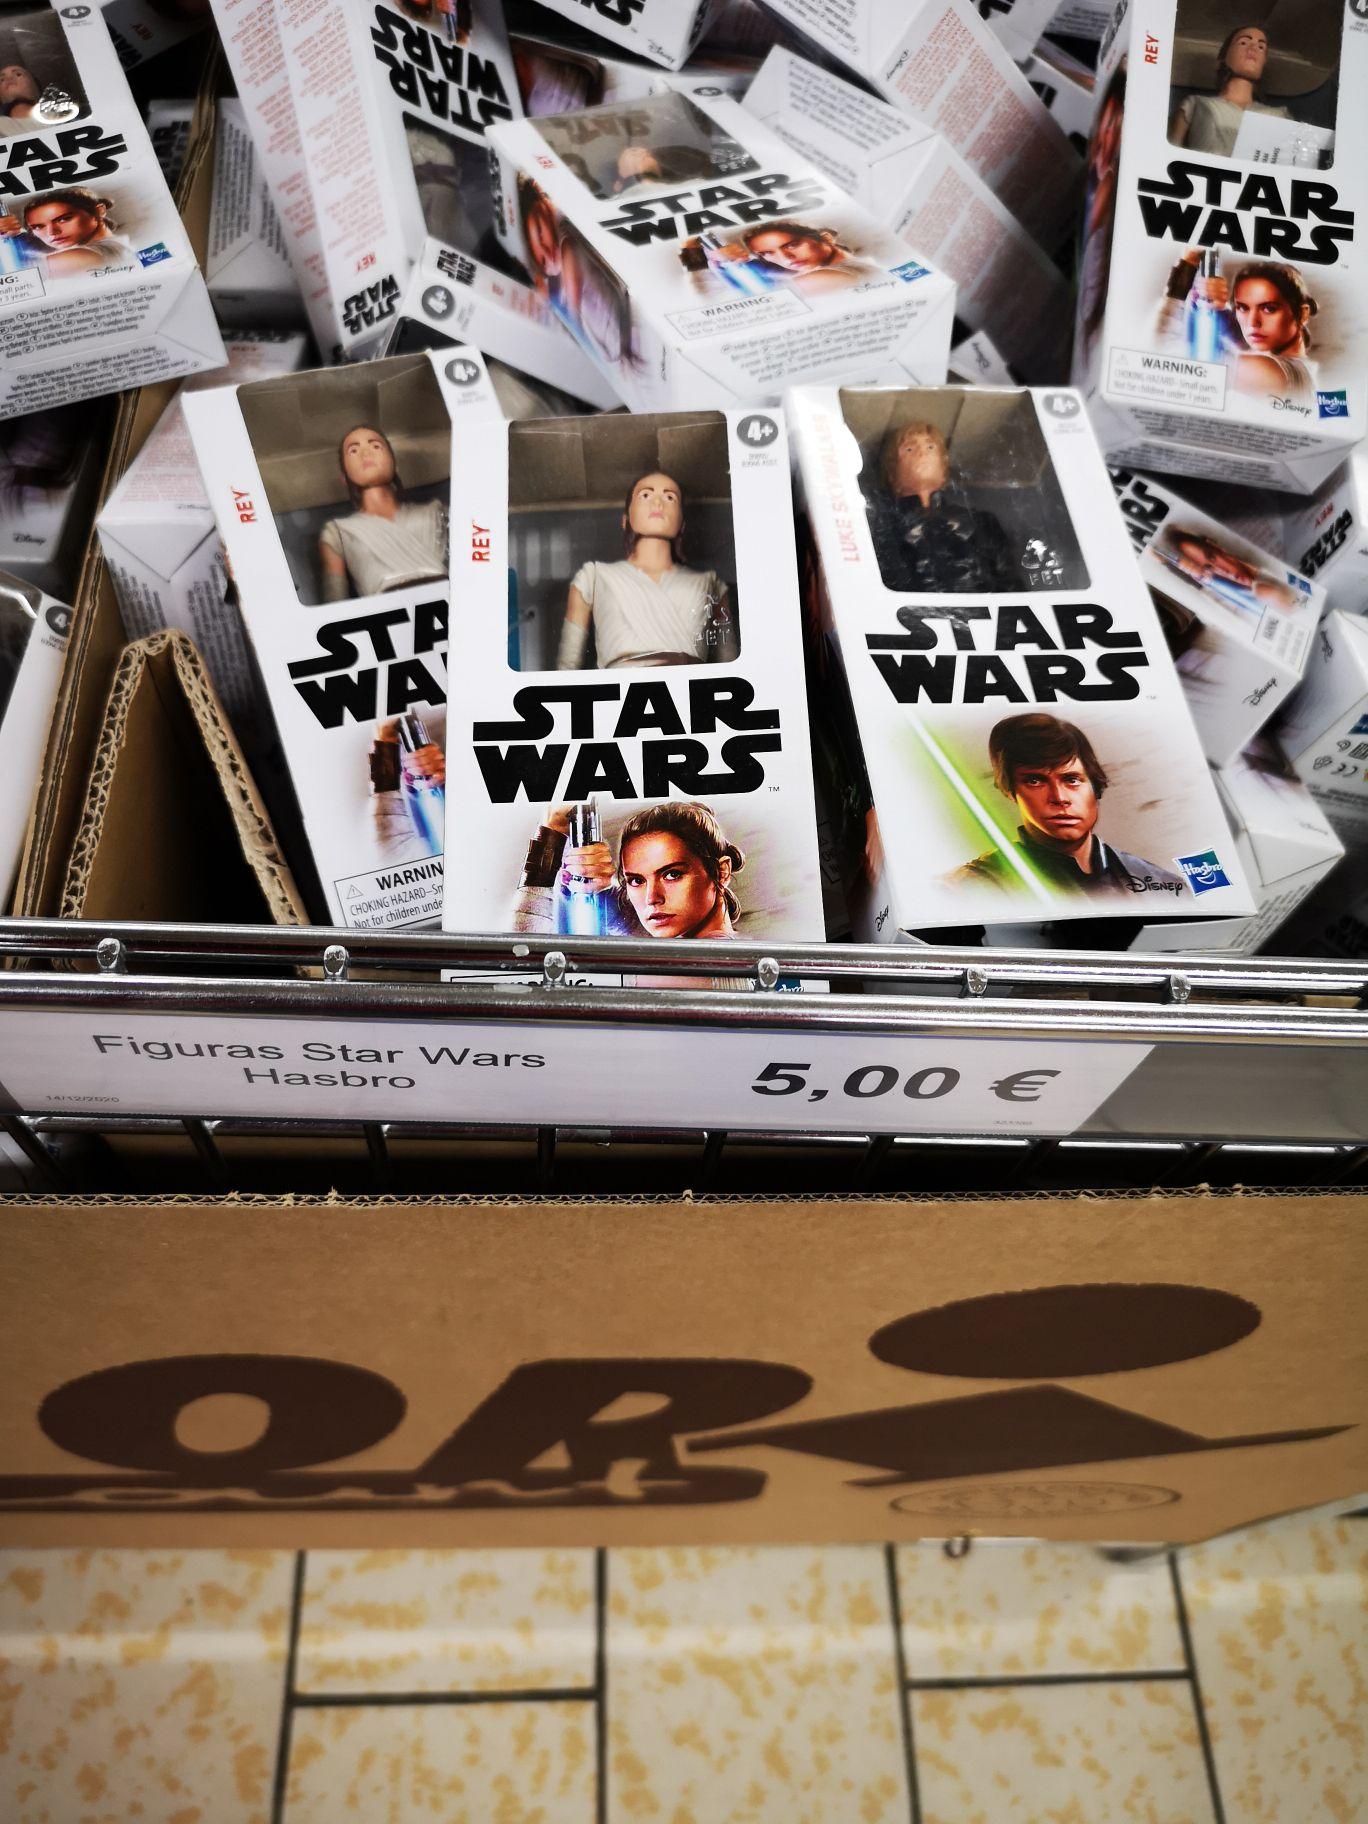 Figuras Star Wars (Lidl Outlet de Pinto)